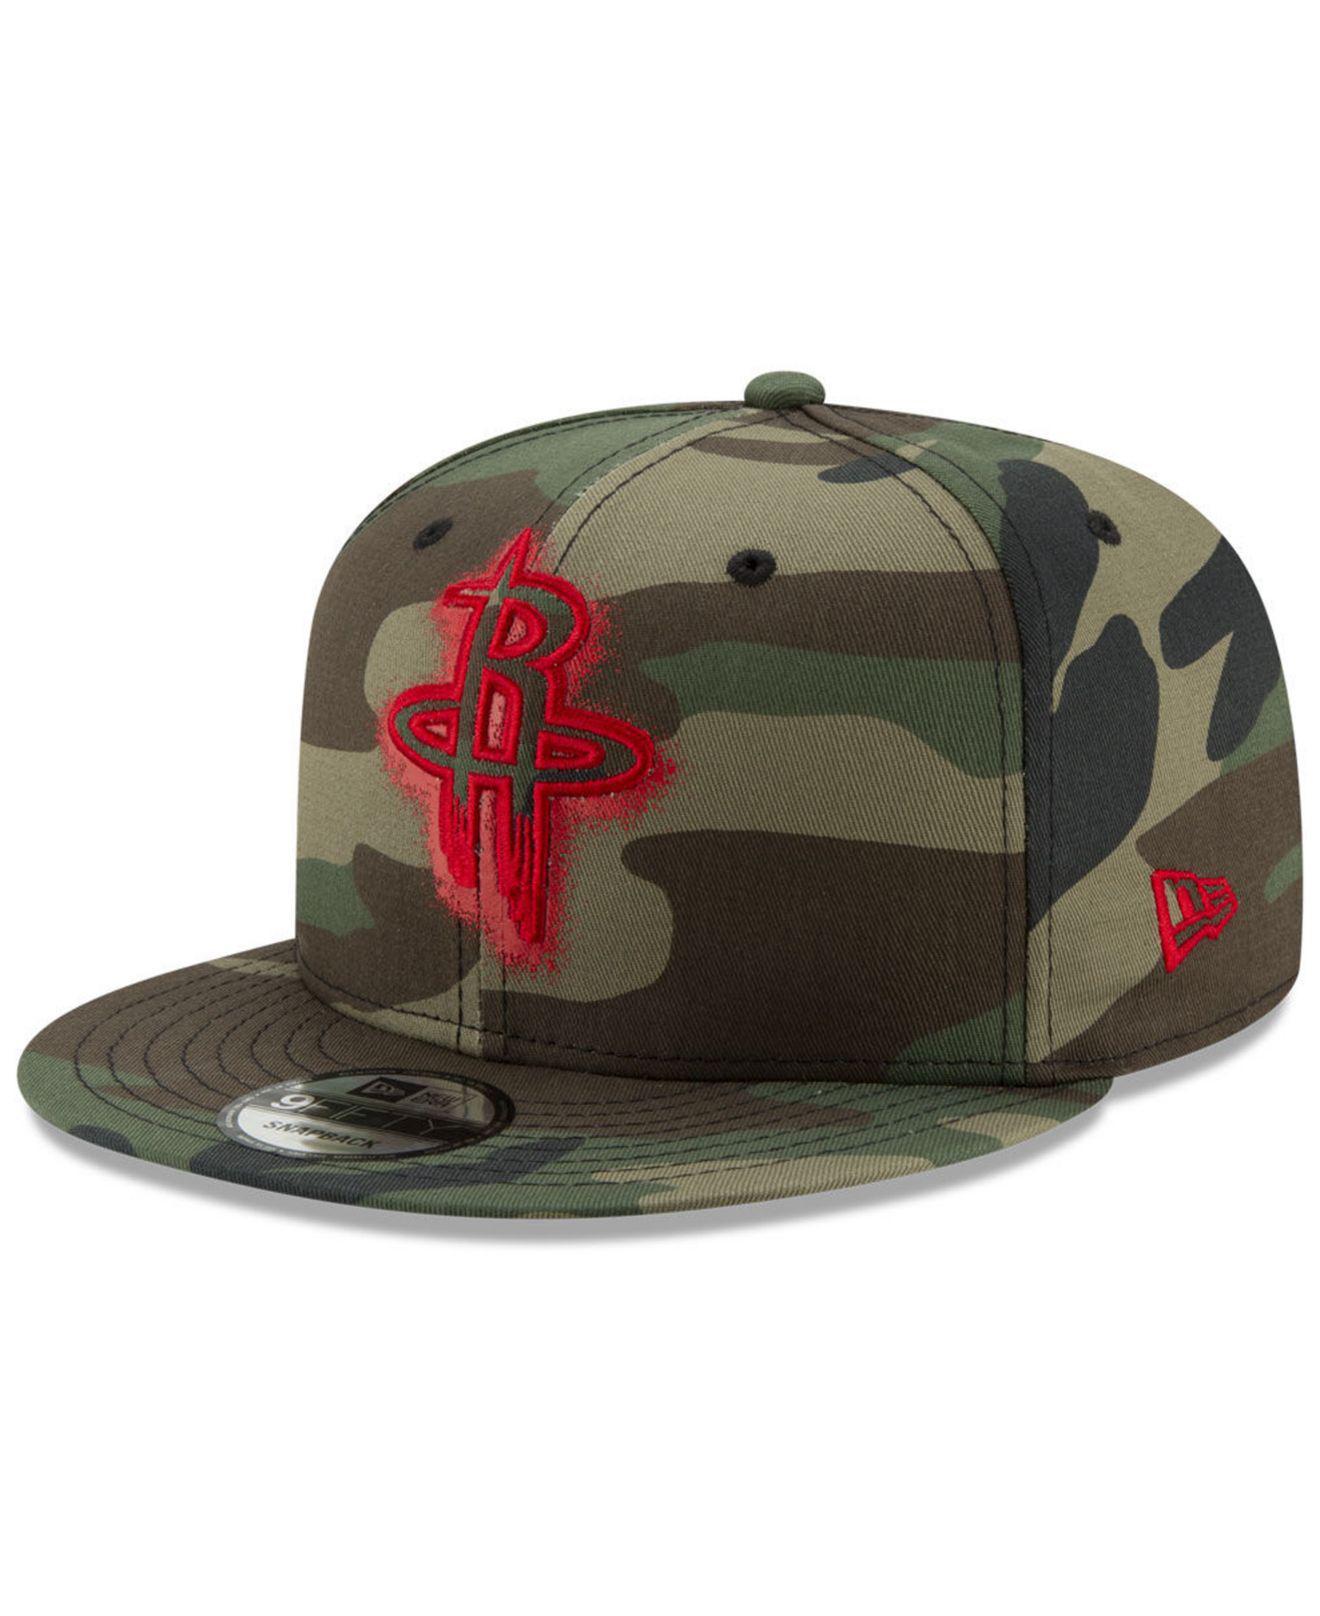 sale retailer 8181c 7eeb2 KTZ - Green Houston Rockets Overspray 9fifty Snapback Cap for Men - Lyst.  View fullscreen